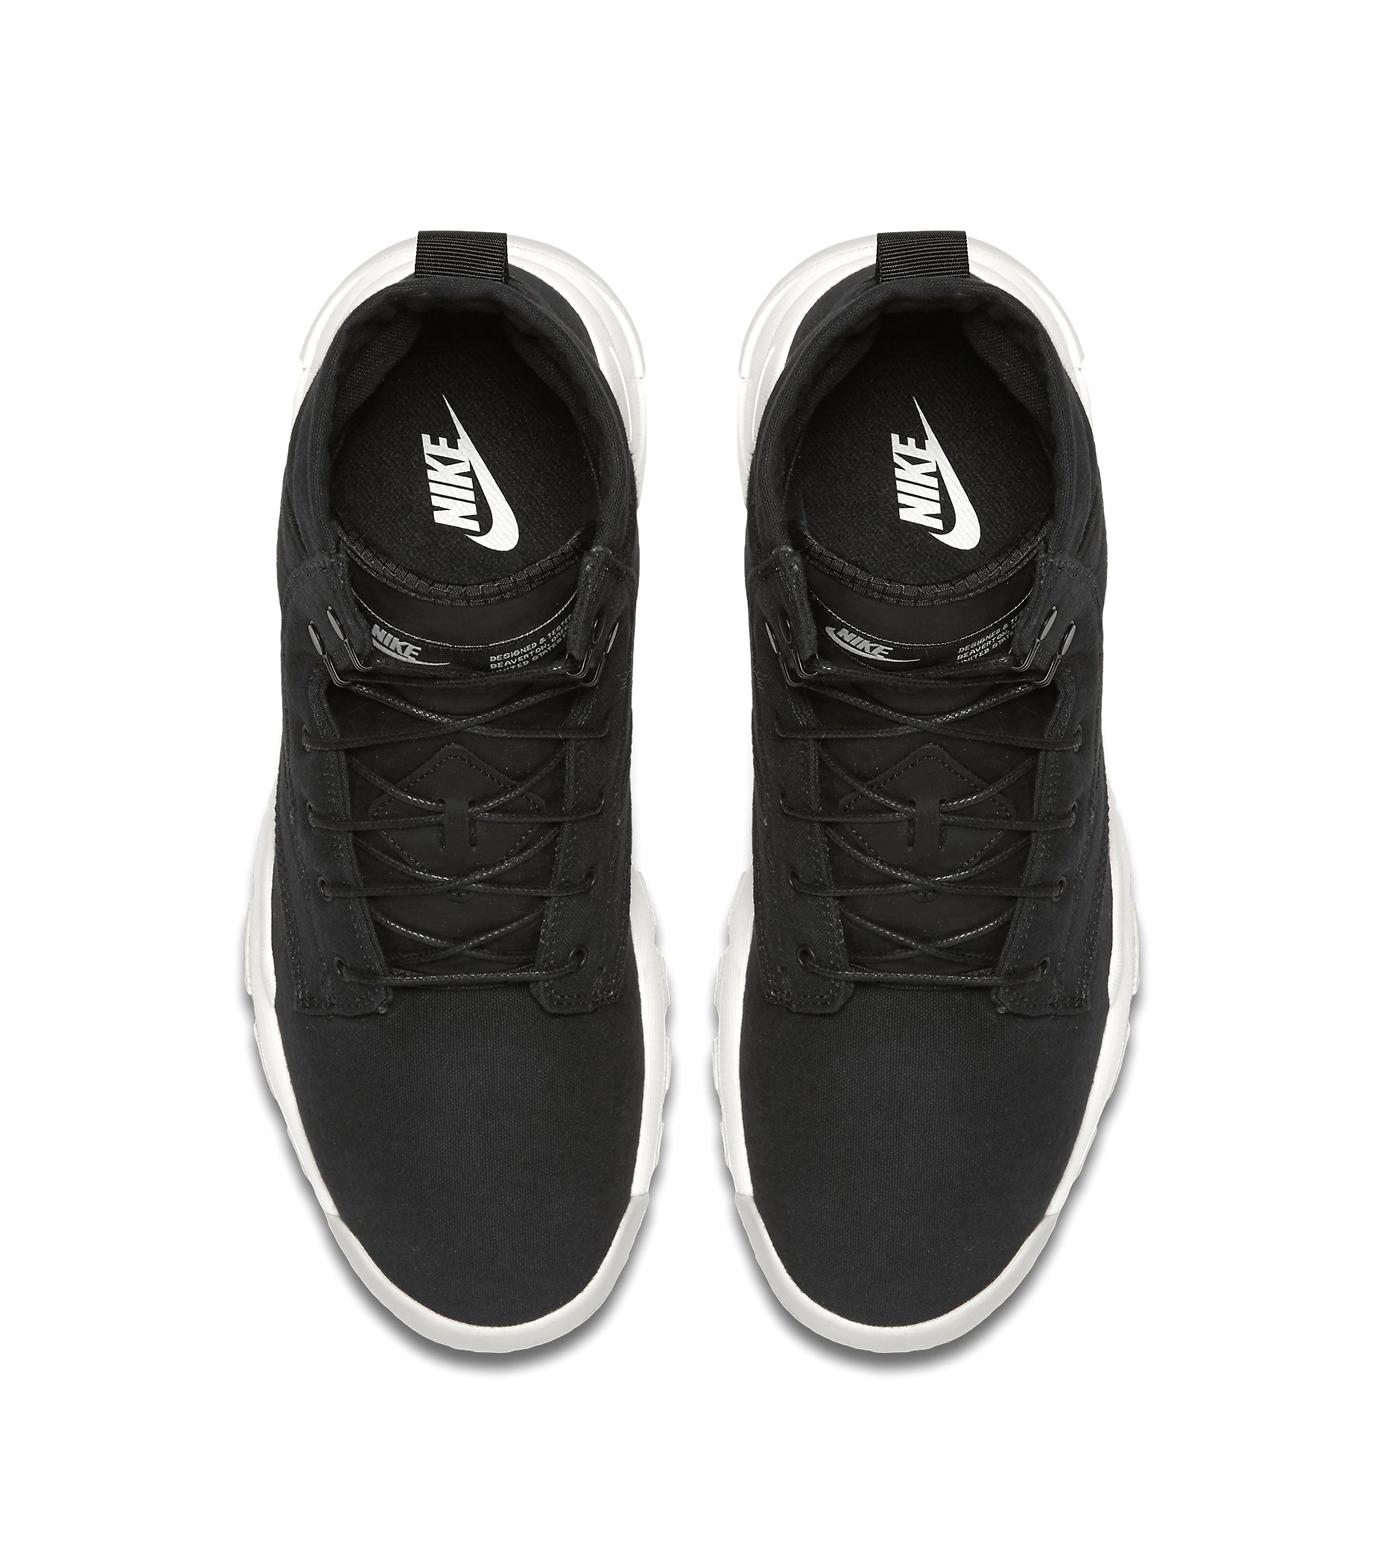 NIKE(ナイキ)のSFB FIELD 6 CANVAS NSW-BLACK(シューズ/shoes)-844577-001-13 拡大詳細画像4